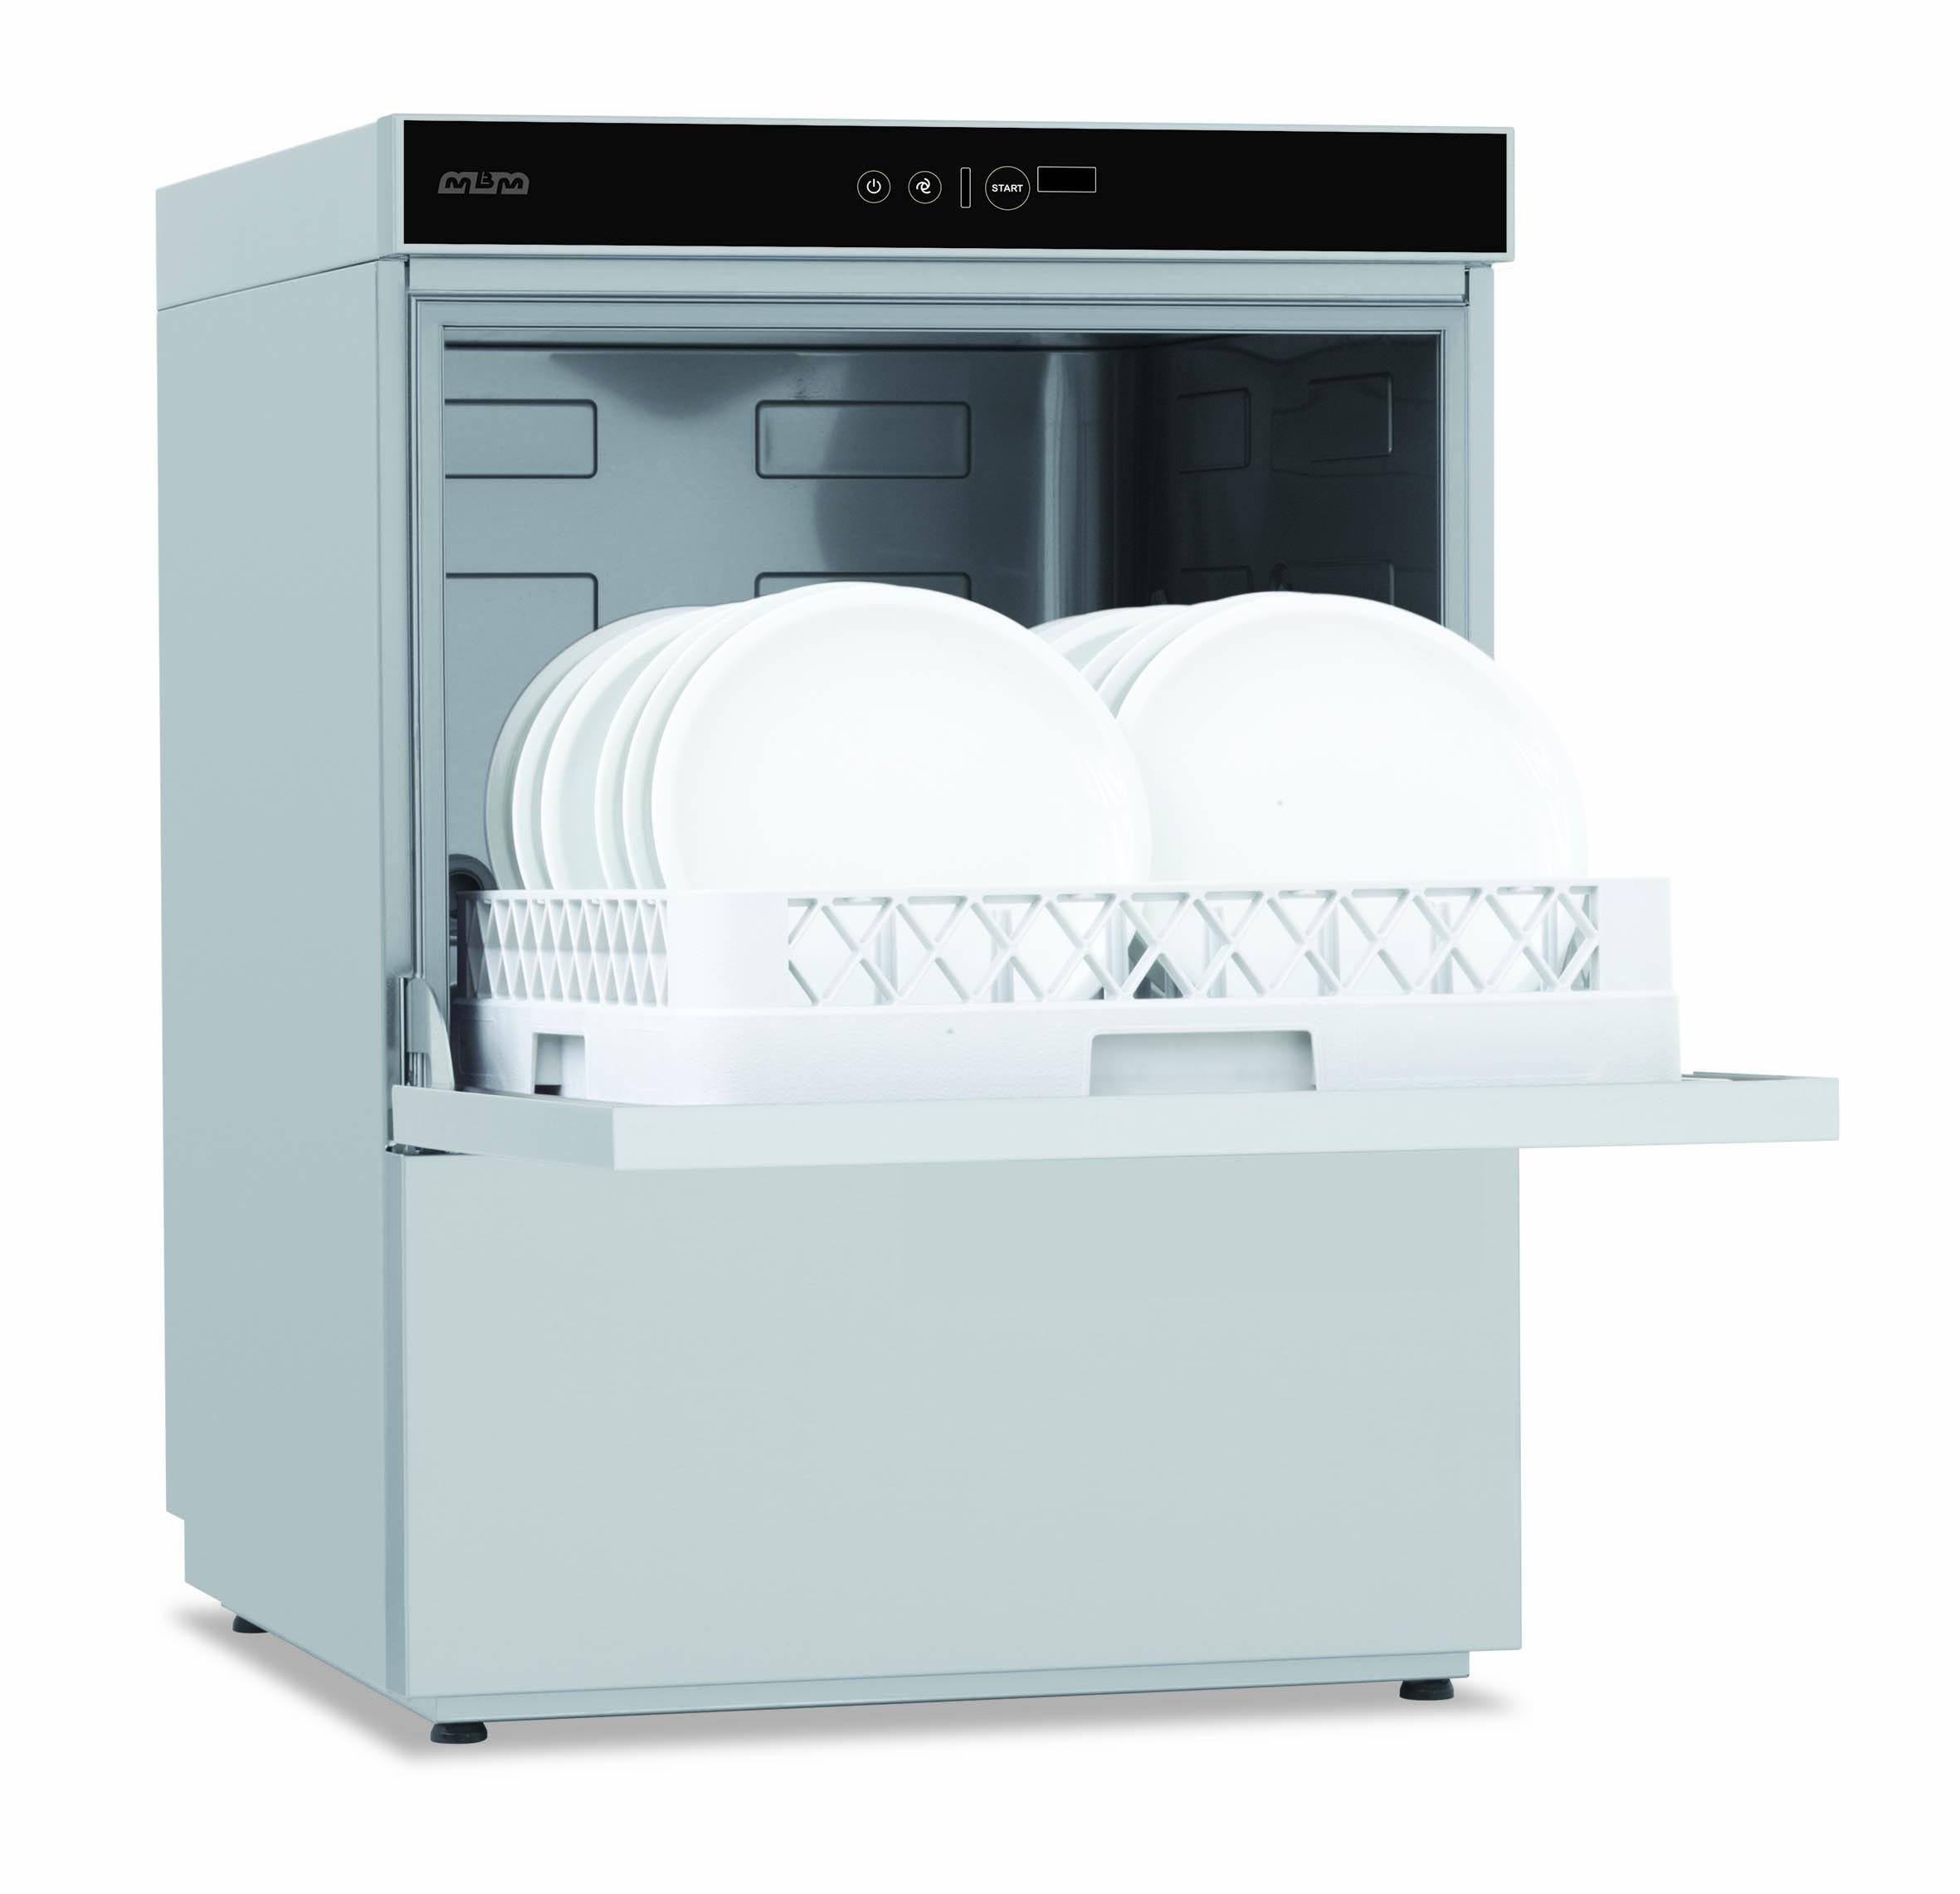 MBM - LS526P - Undercounter dishwasher, [...]